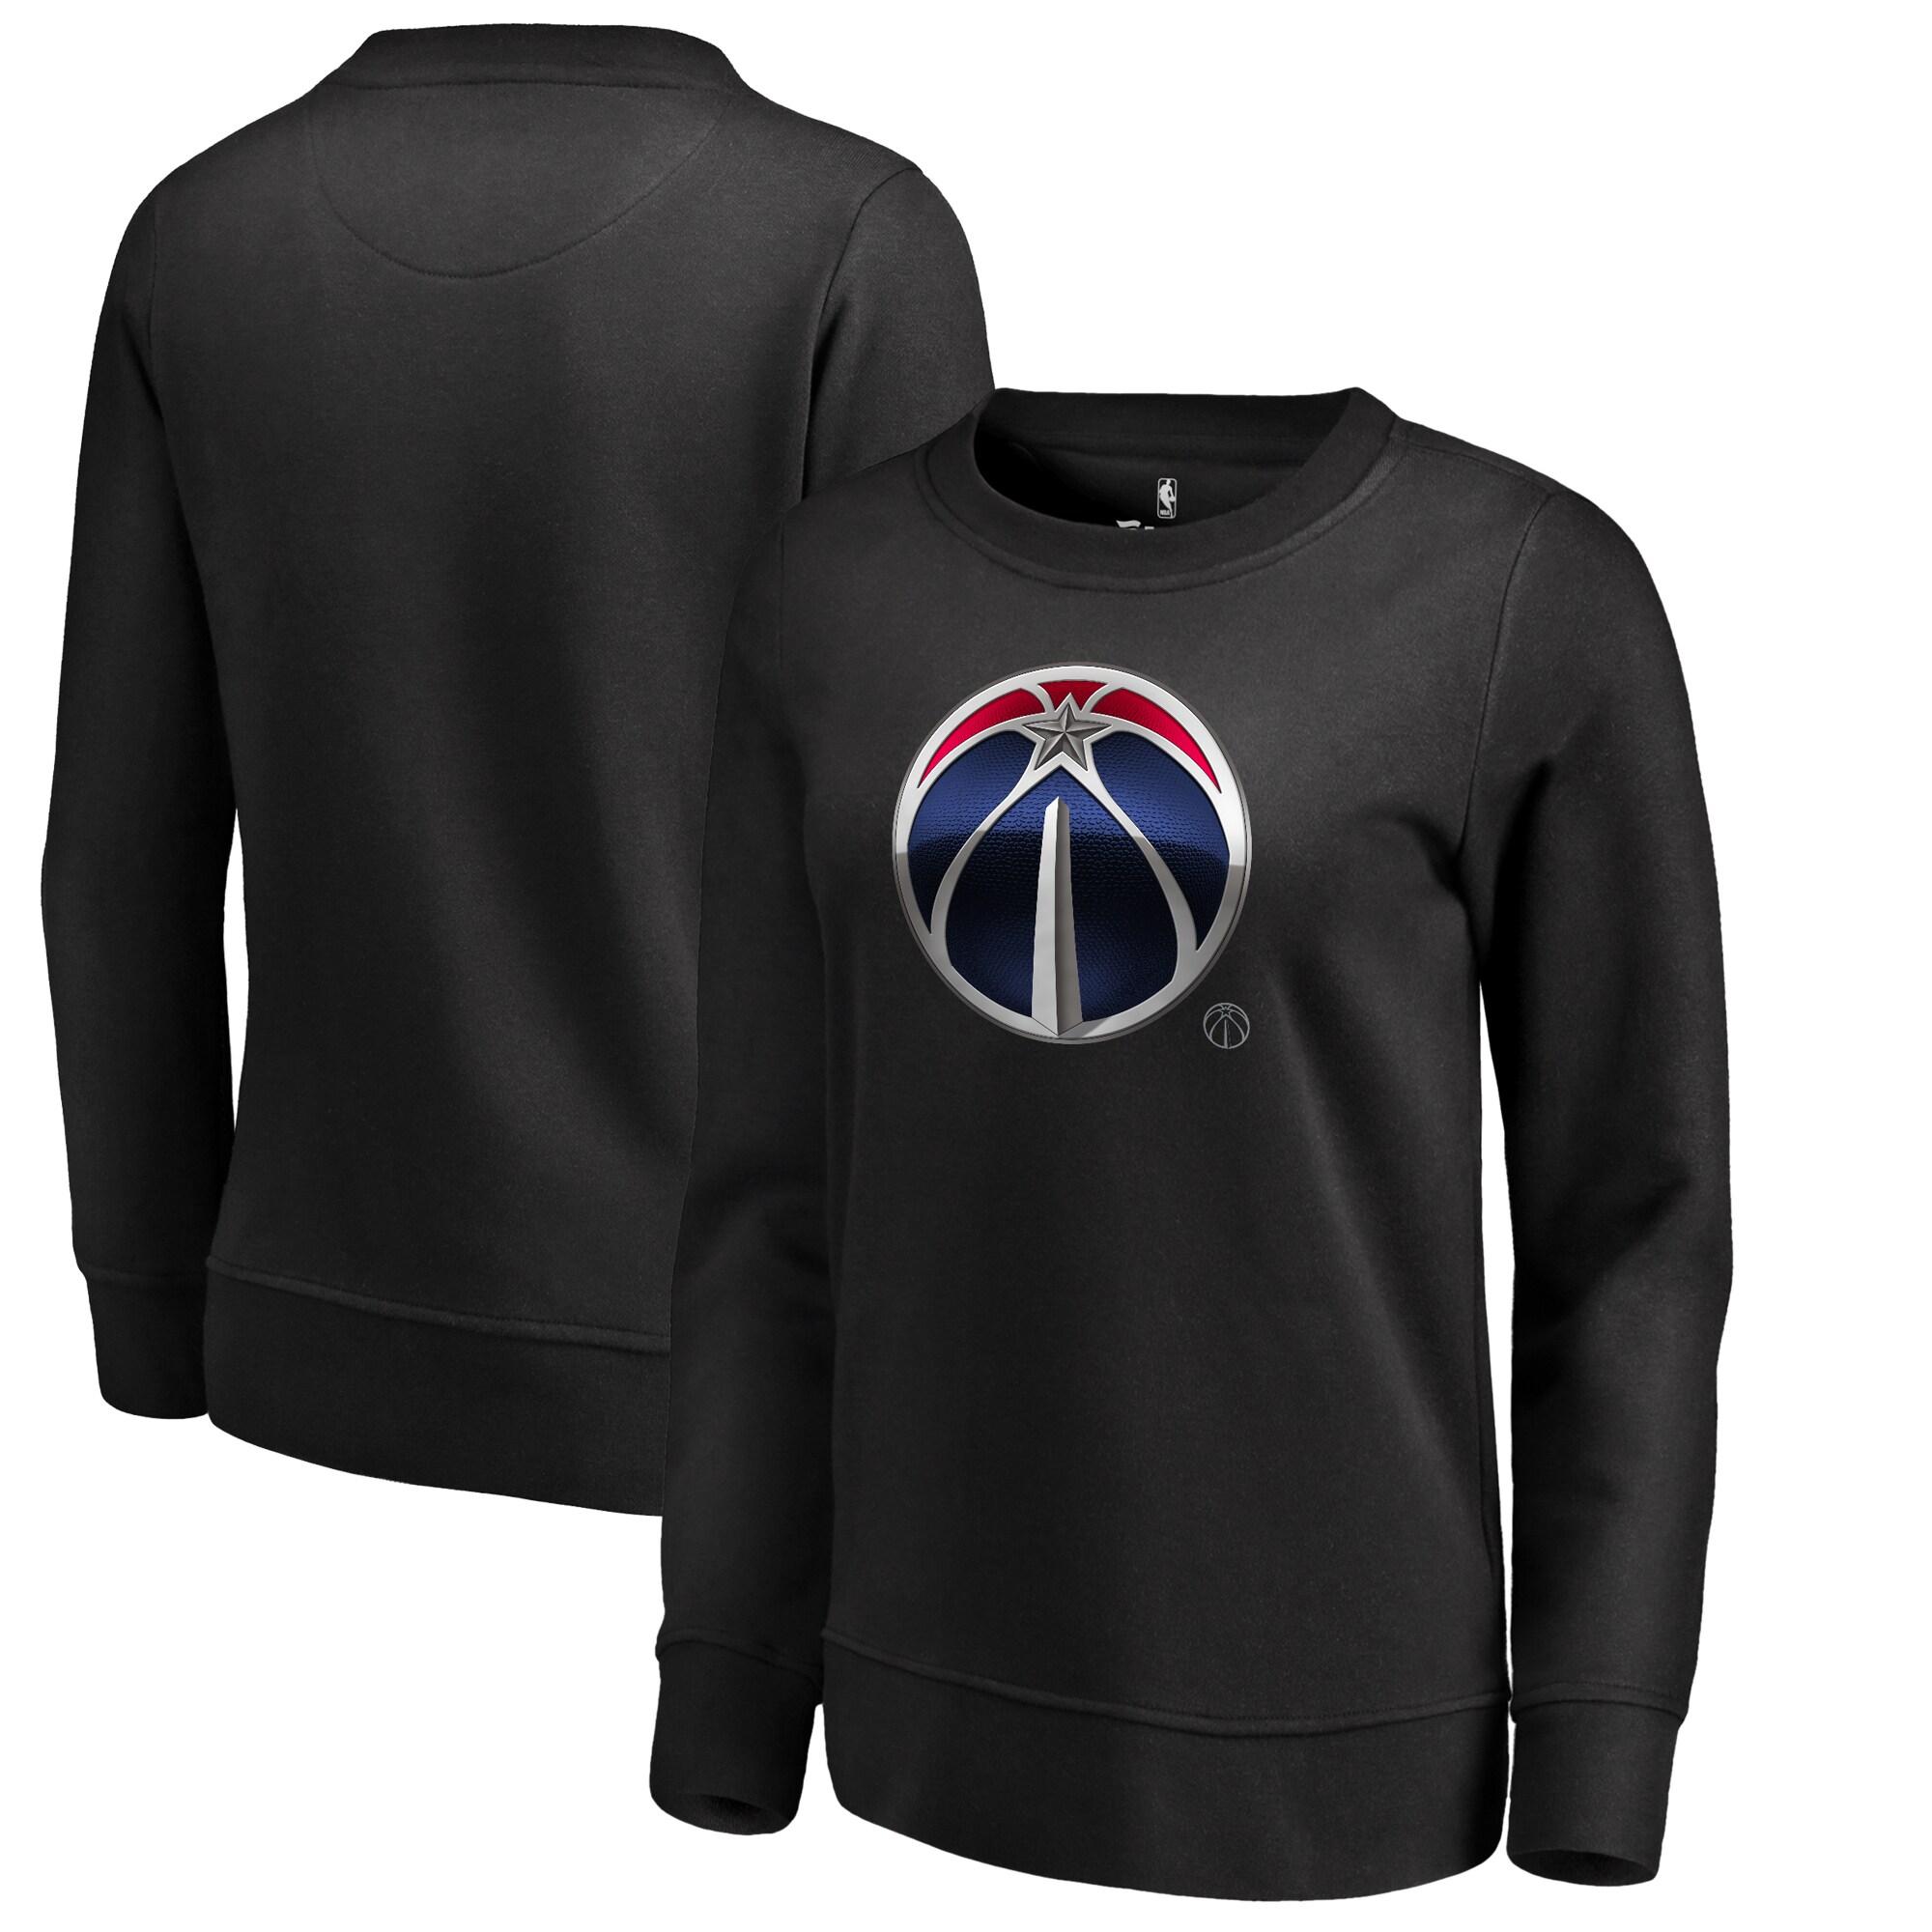 Washington Wizards Fanatics Branded Women's Midnight Mascot Pullover Sweatshirt - Black